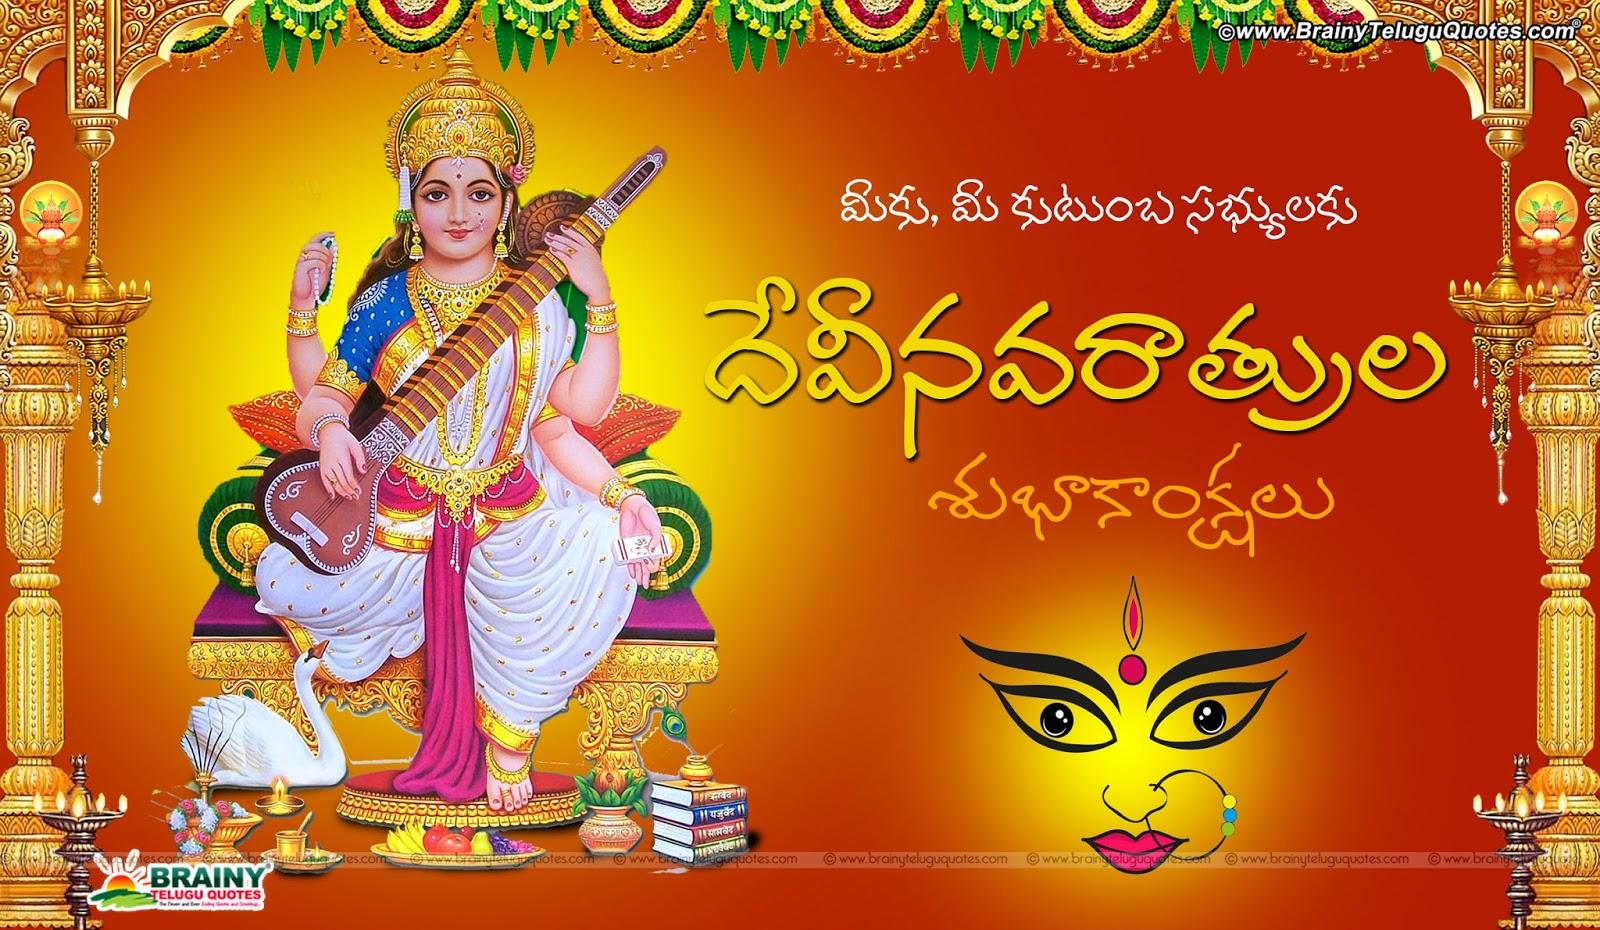 Saraswathi pooja wishes in telugu goddess saraswathi images with saraswathi pooja wishes in telugu goddess saraswathi images with dussehra wishes in telugu m4hsunfo